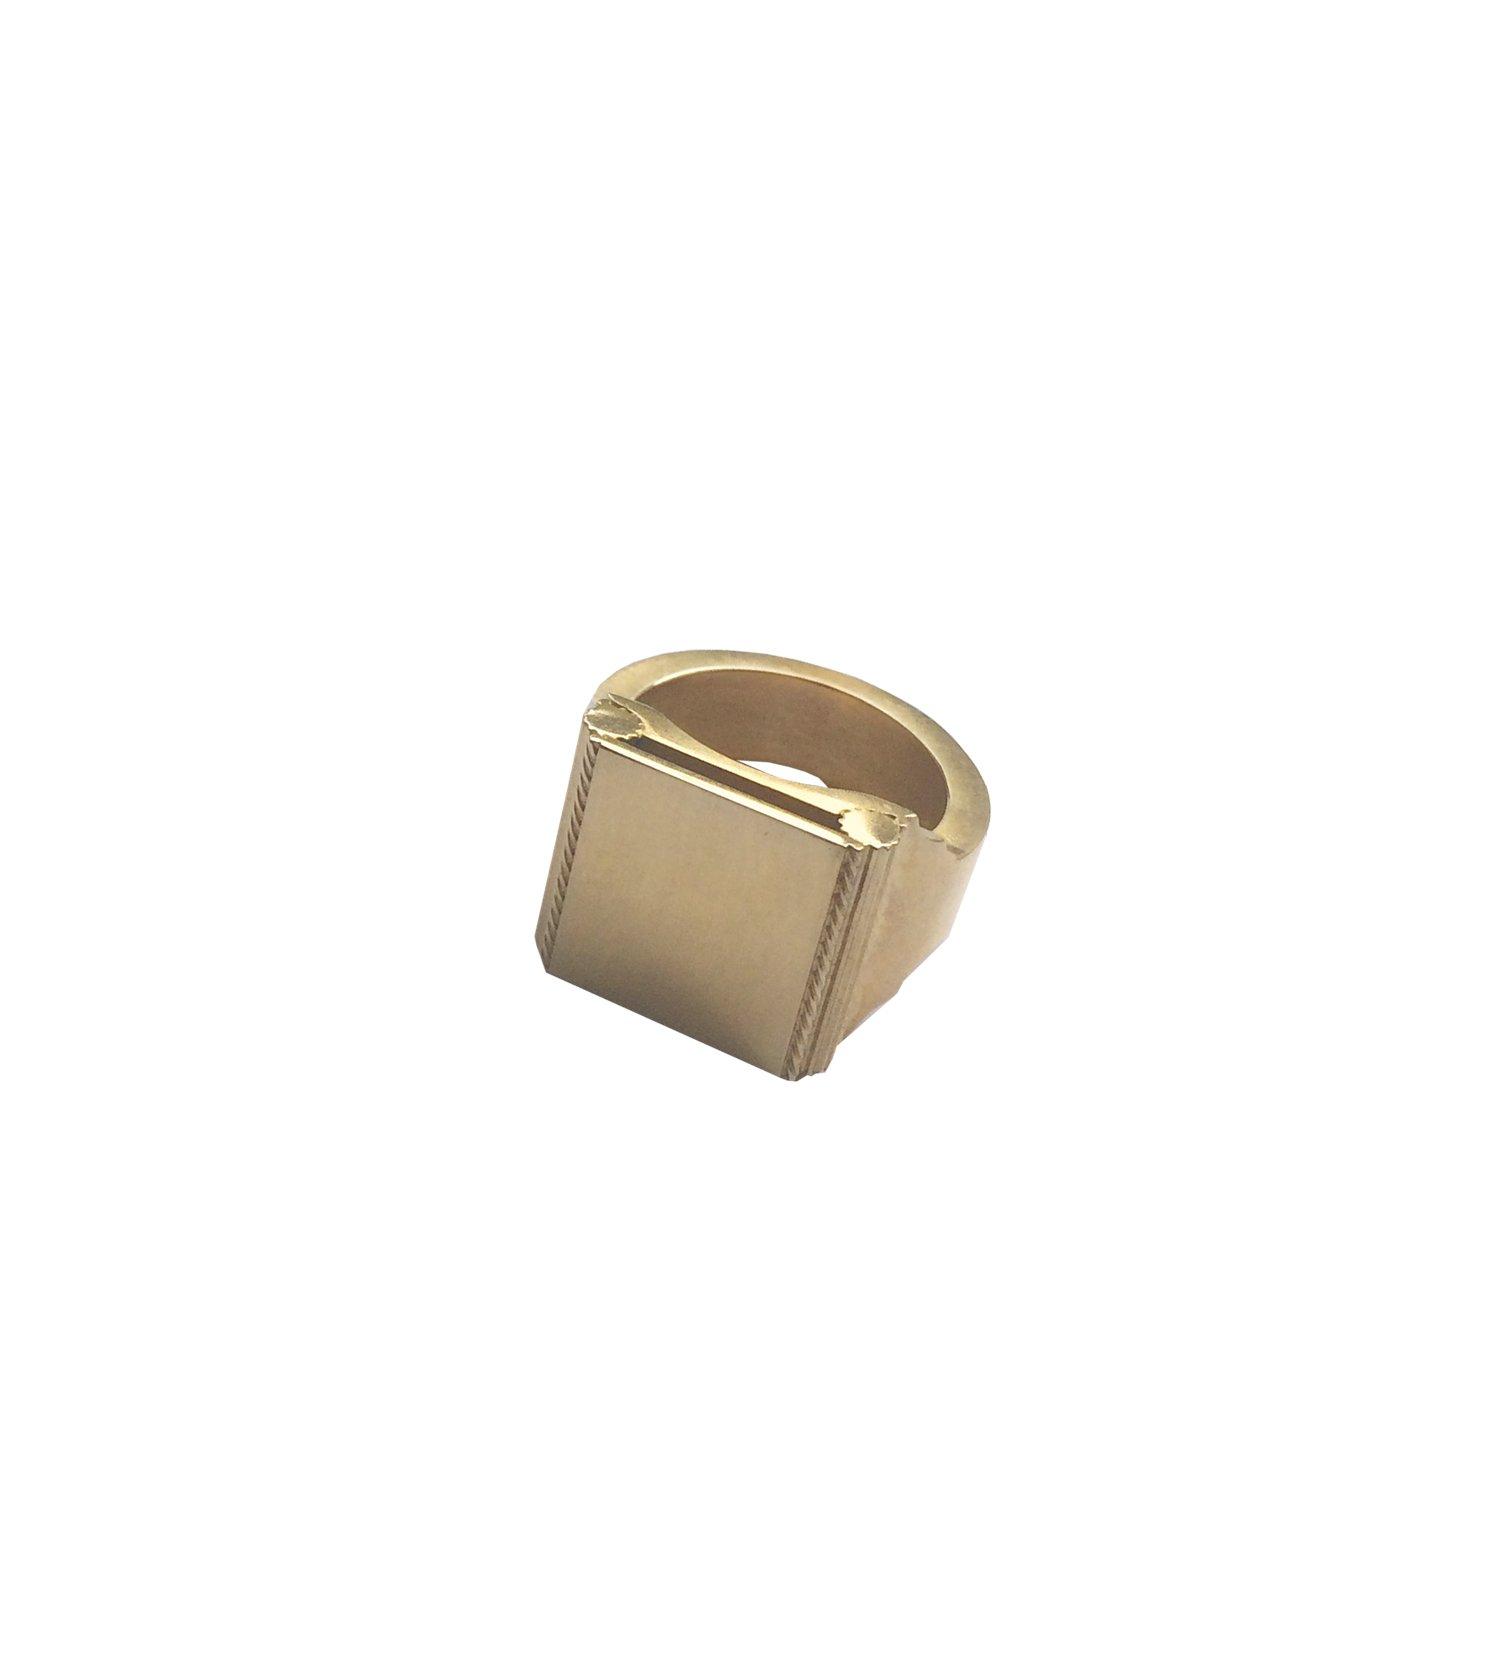 Image of Decor Signet ring